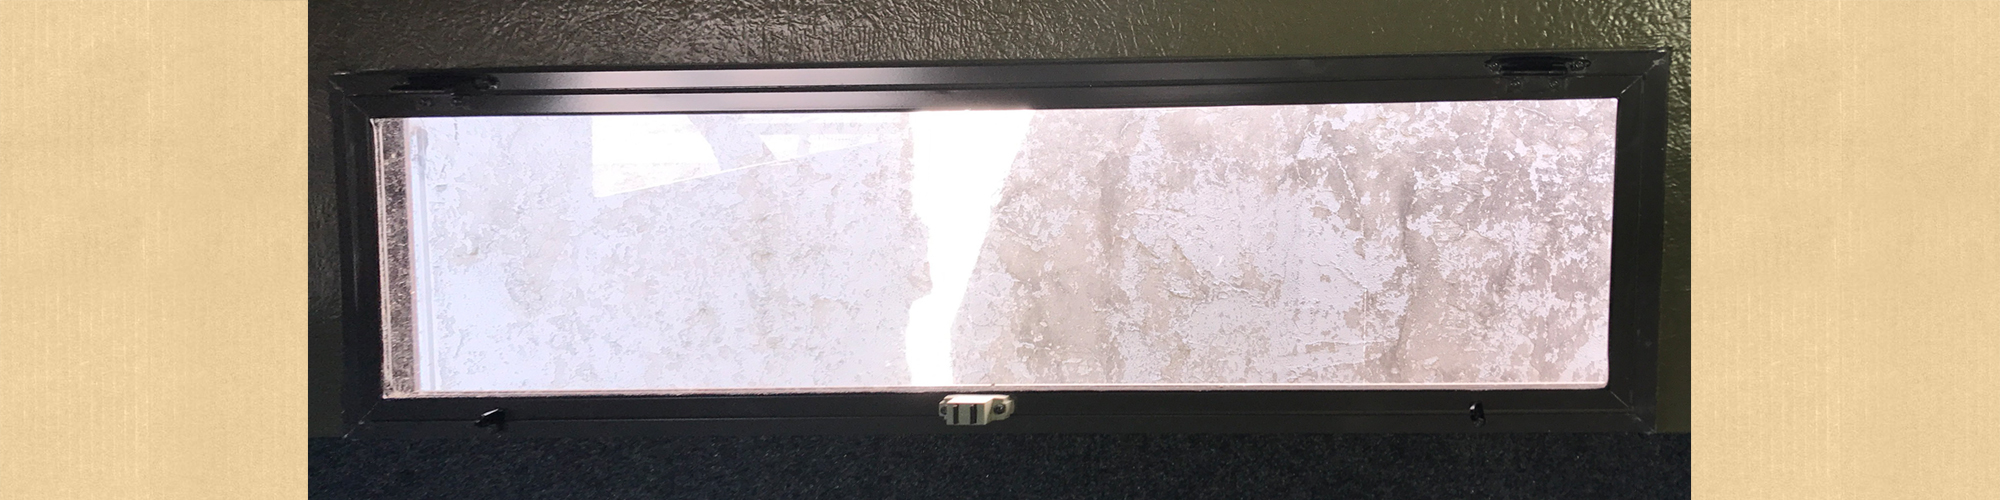 deer blind windows cleburne tx the original deer blind window co original deer blind window co